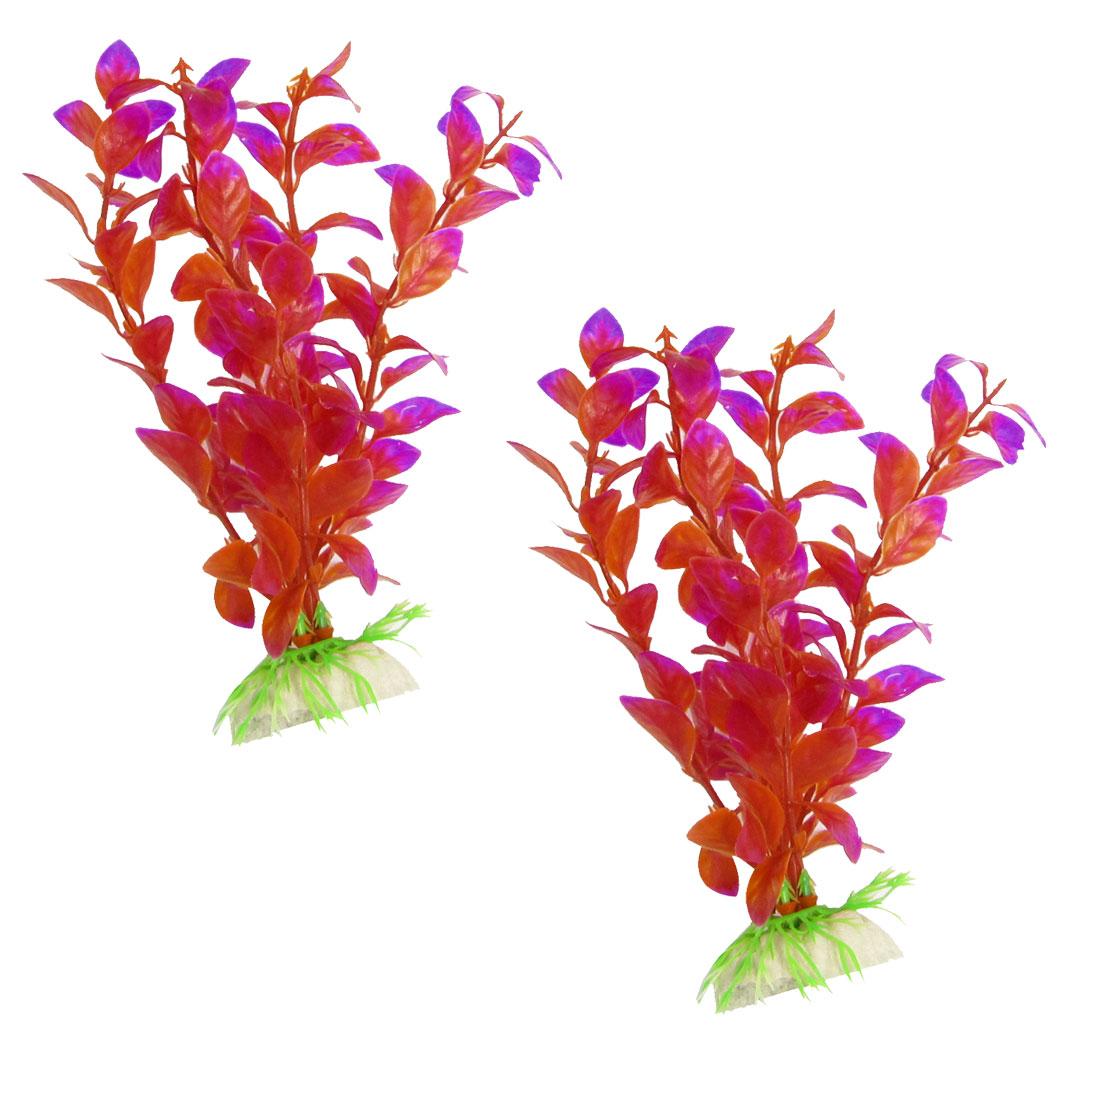 2 Pcs Purple Red Flower Plastic Waterweed Grass for Aquarium Fish Tank